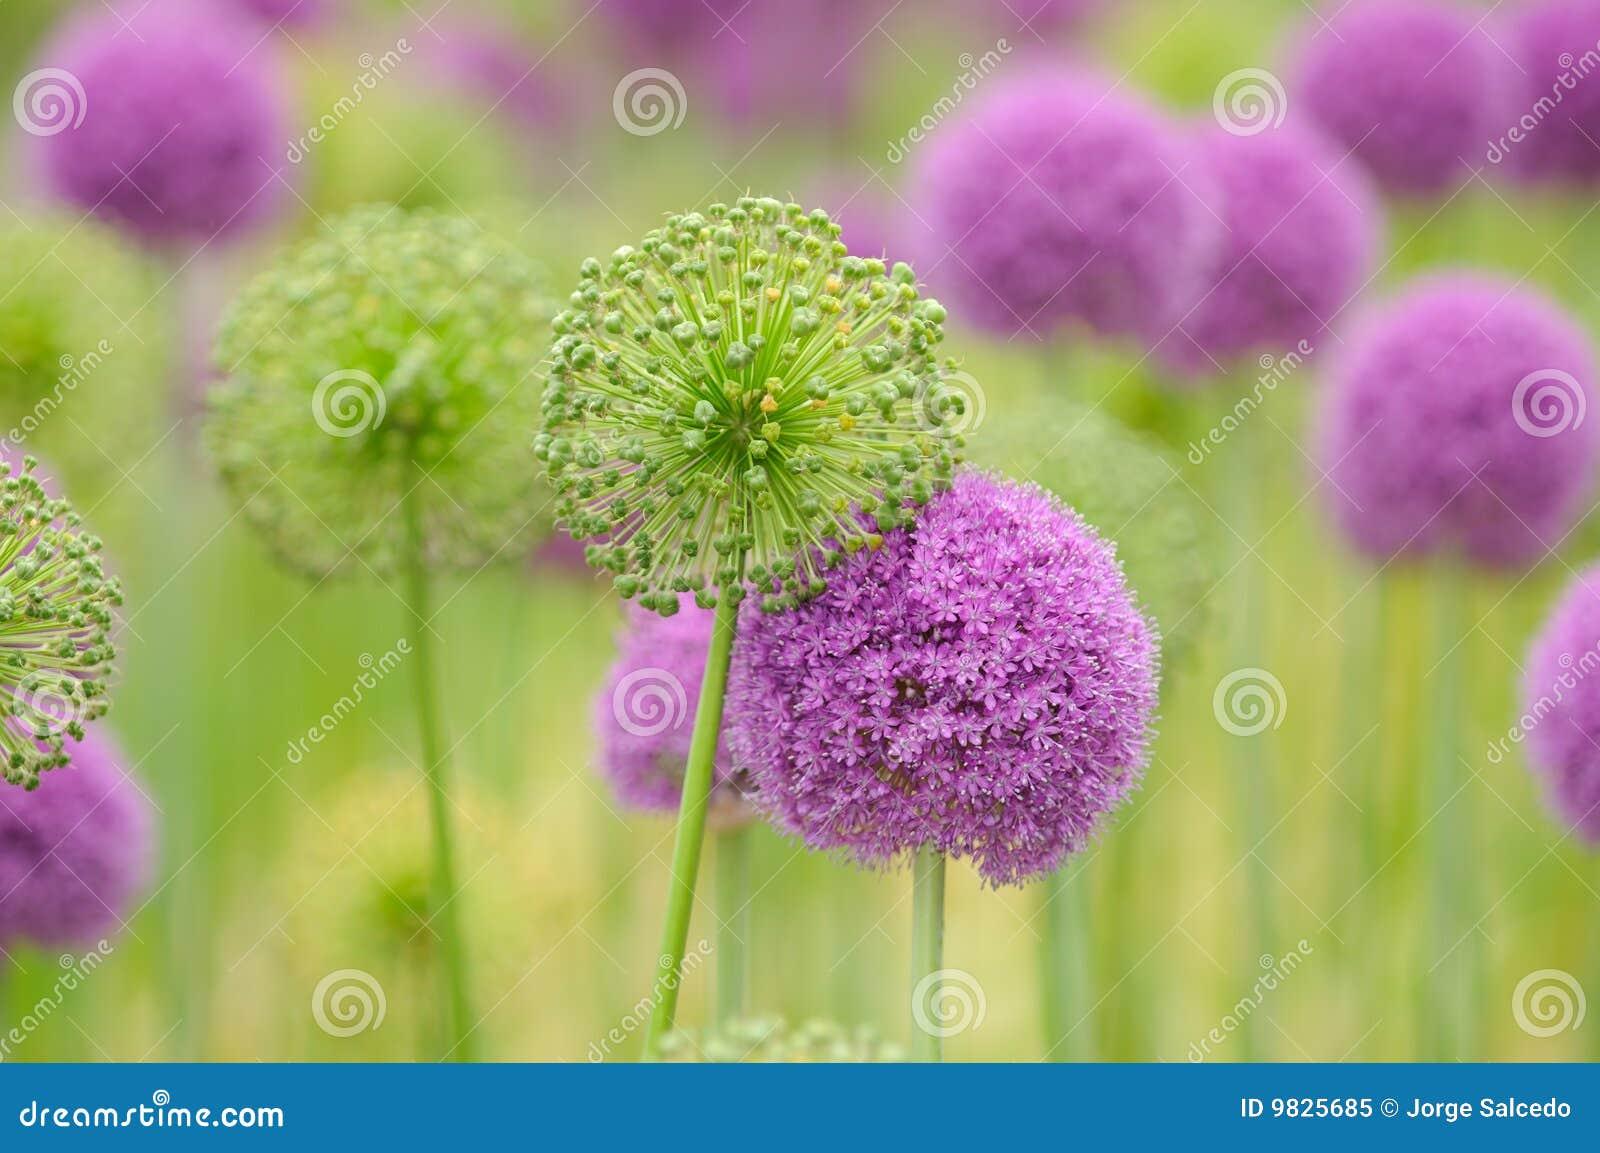 Fondo de la flor del allium